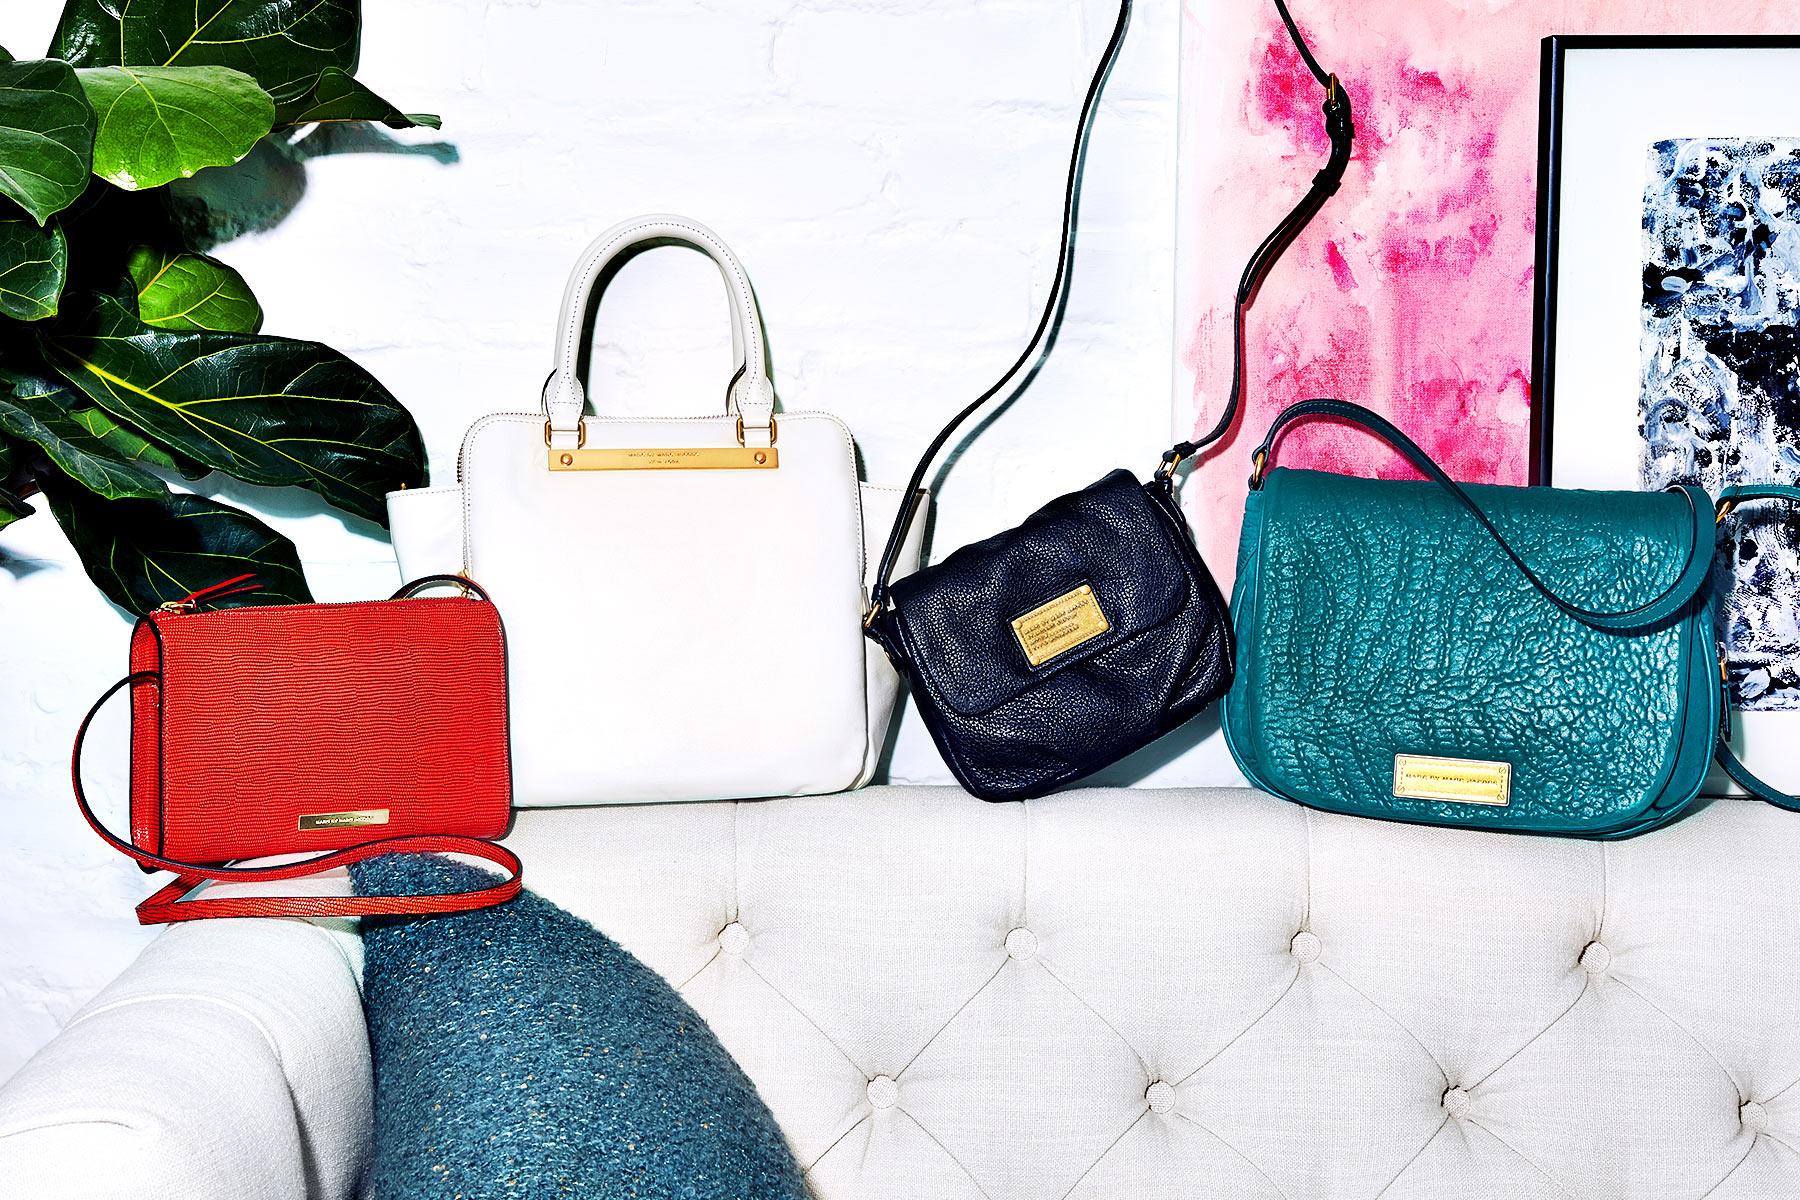 Marc_by_Marc_Jacobs_Handbags.jpg